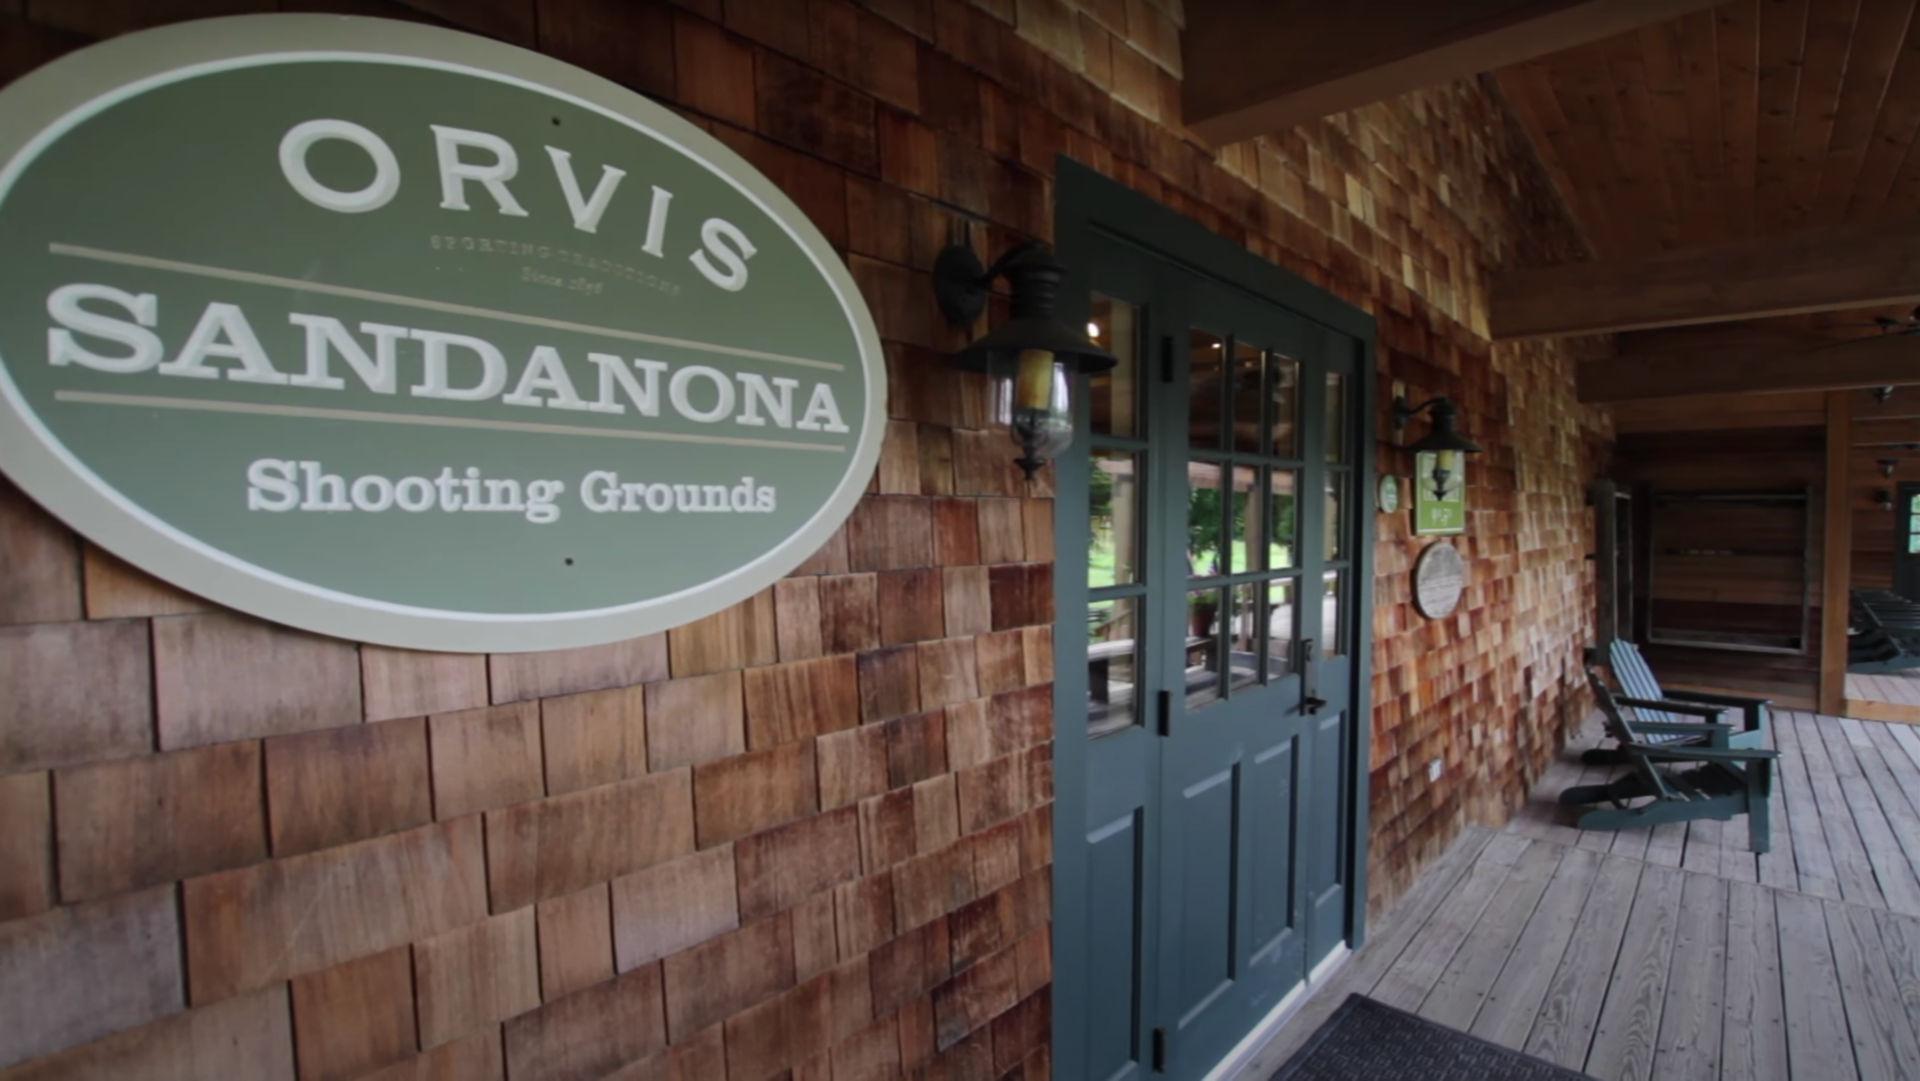 Sandanona Shooting Grounds front porch entrance